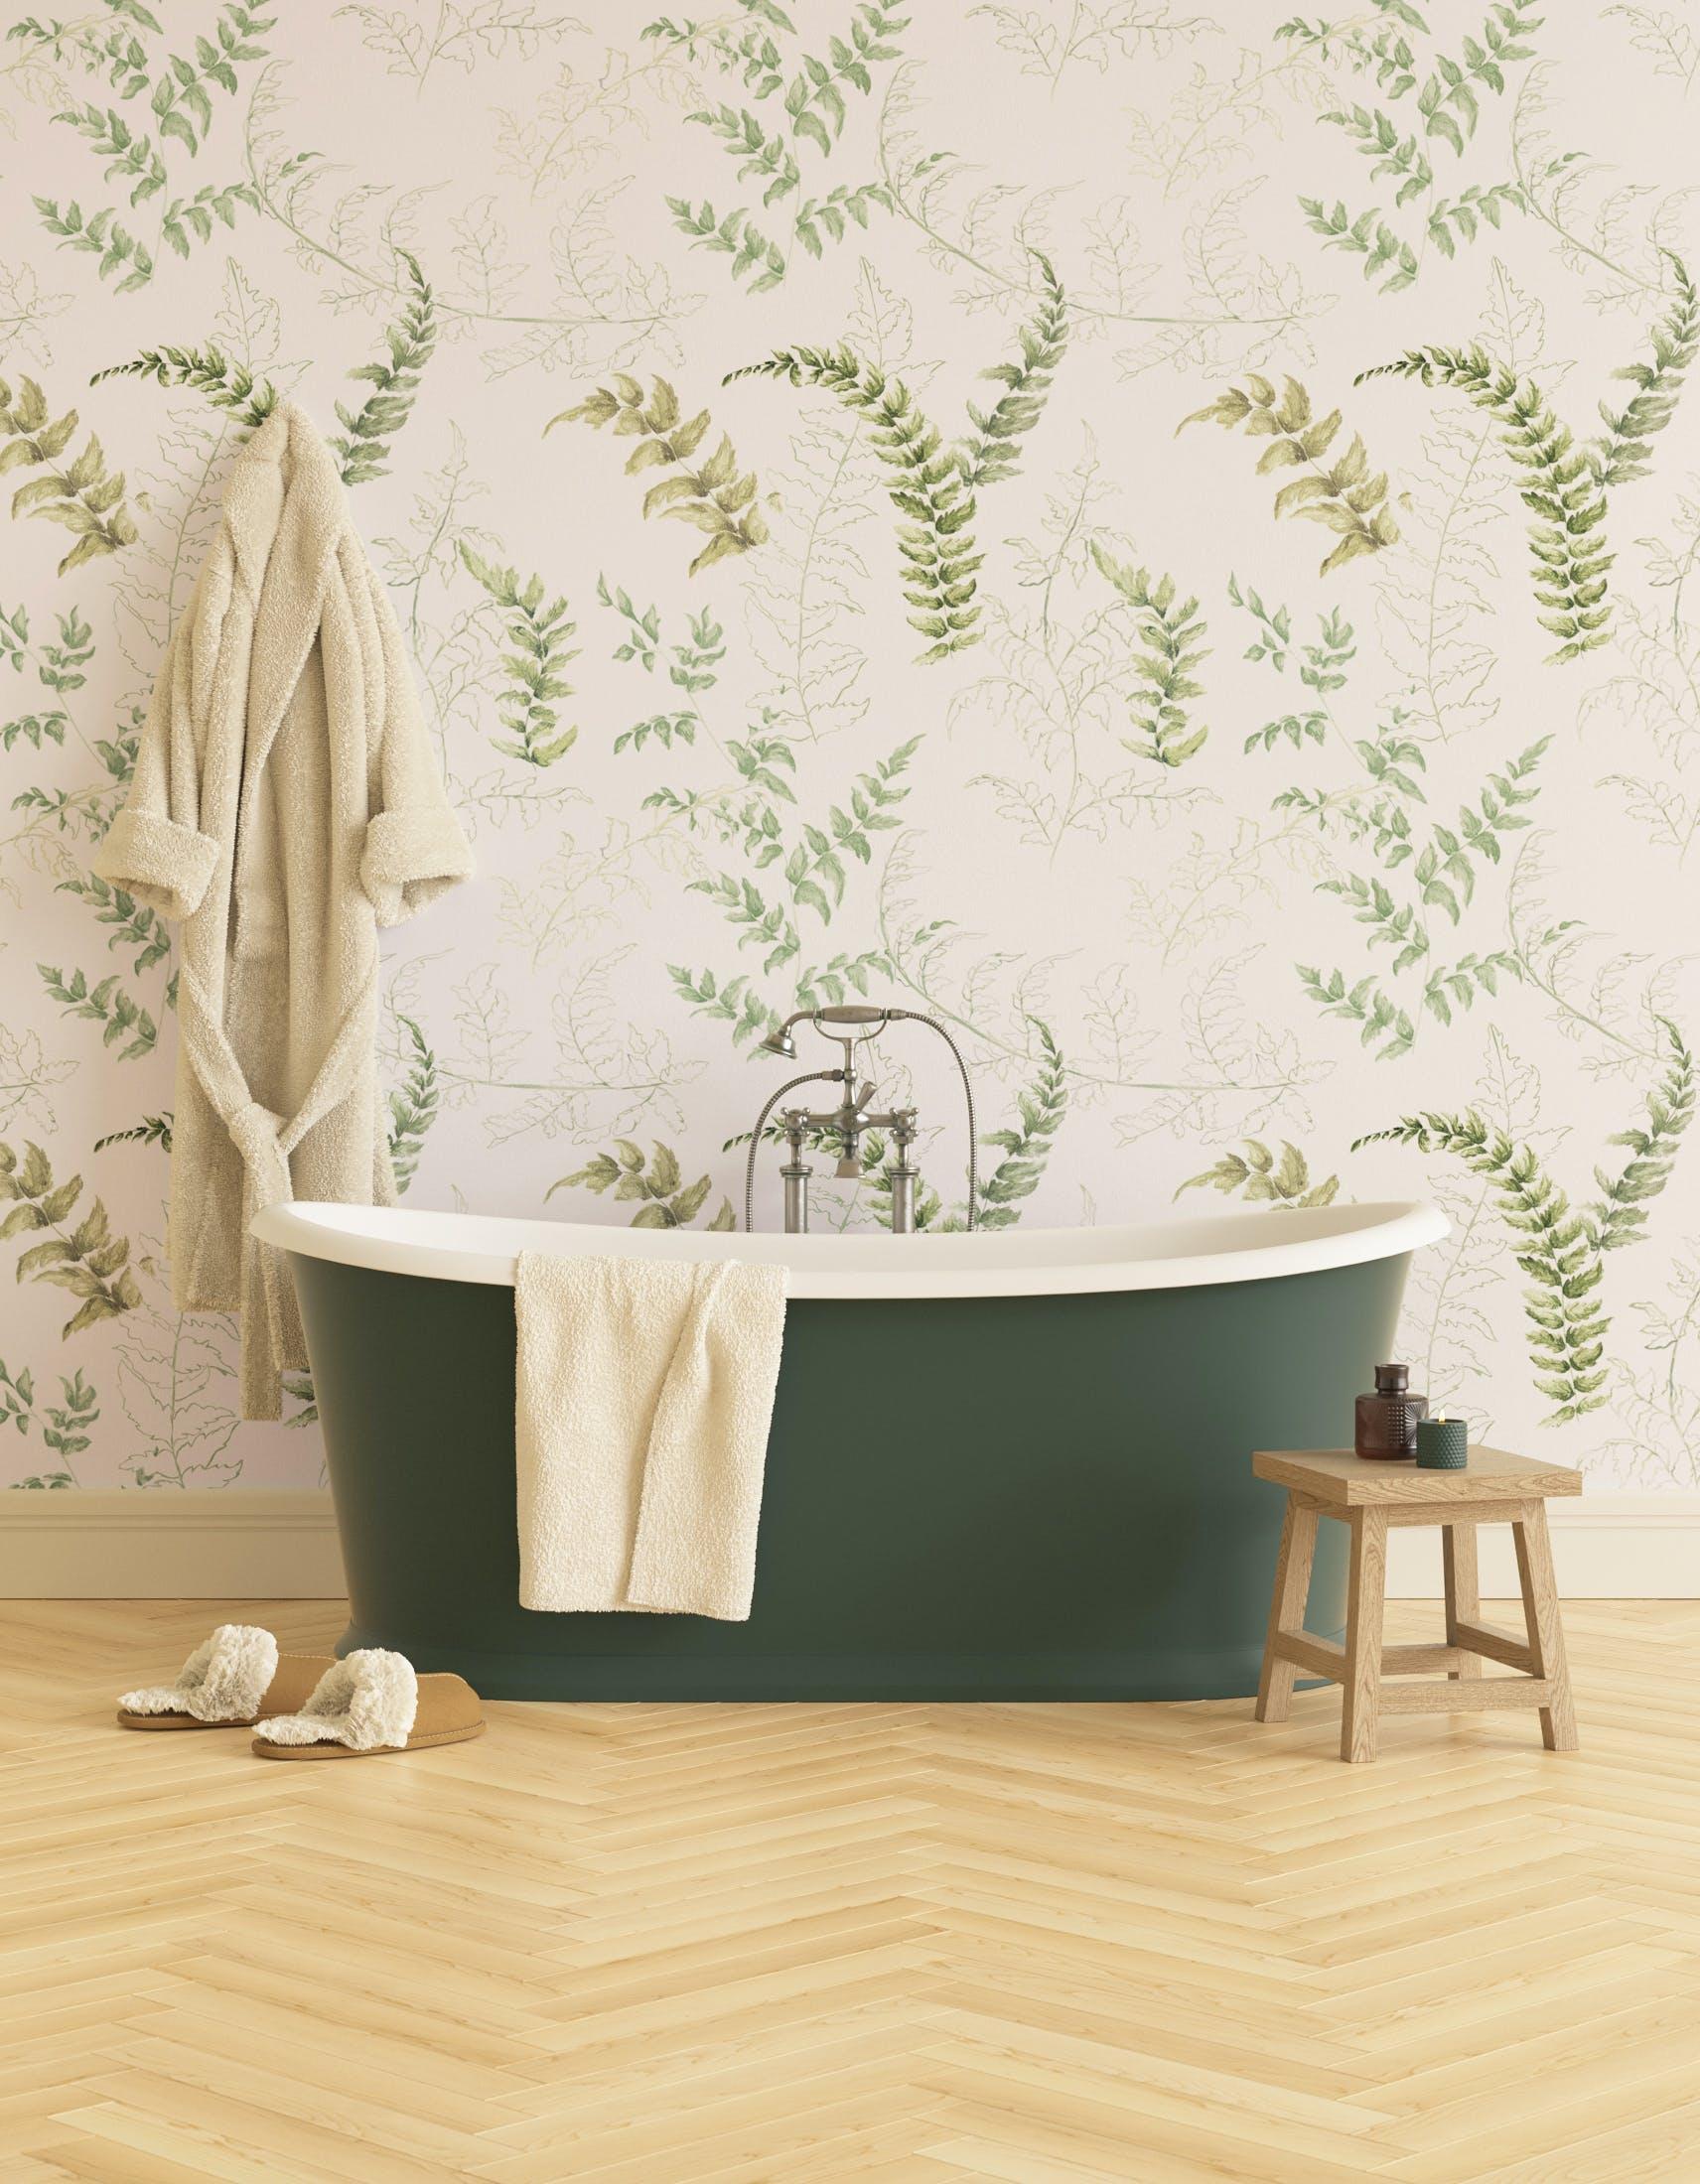 Bathroom decorated with Lick x Jenna Hewitt Fern 01 green botanical wallpaper